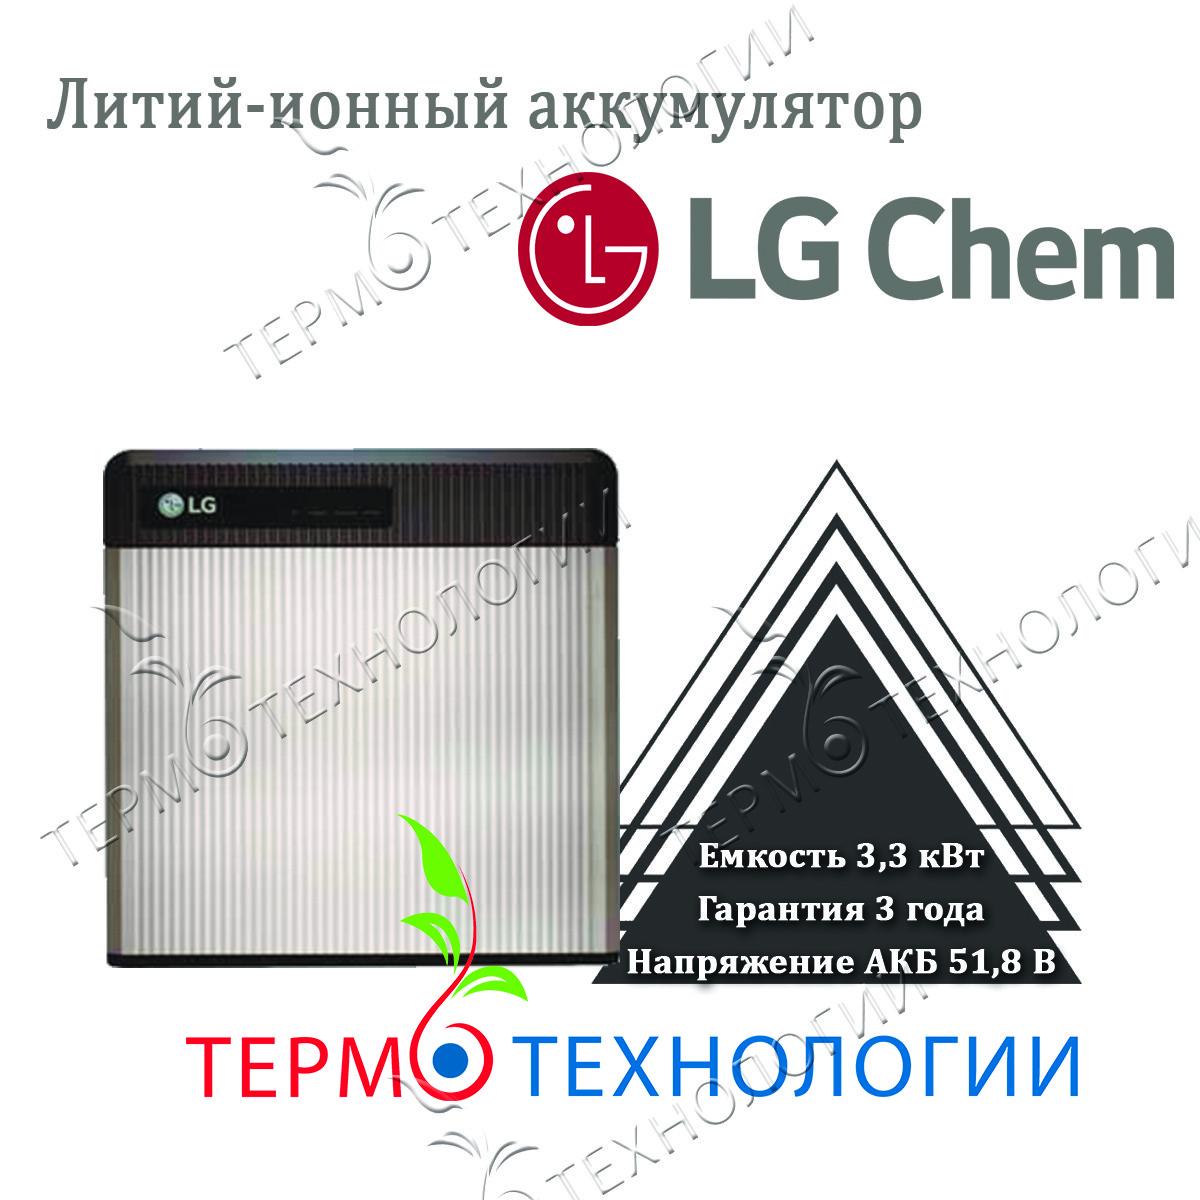 Аккумулятор литий-ионный LG Chem